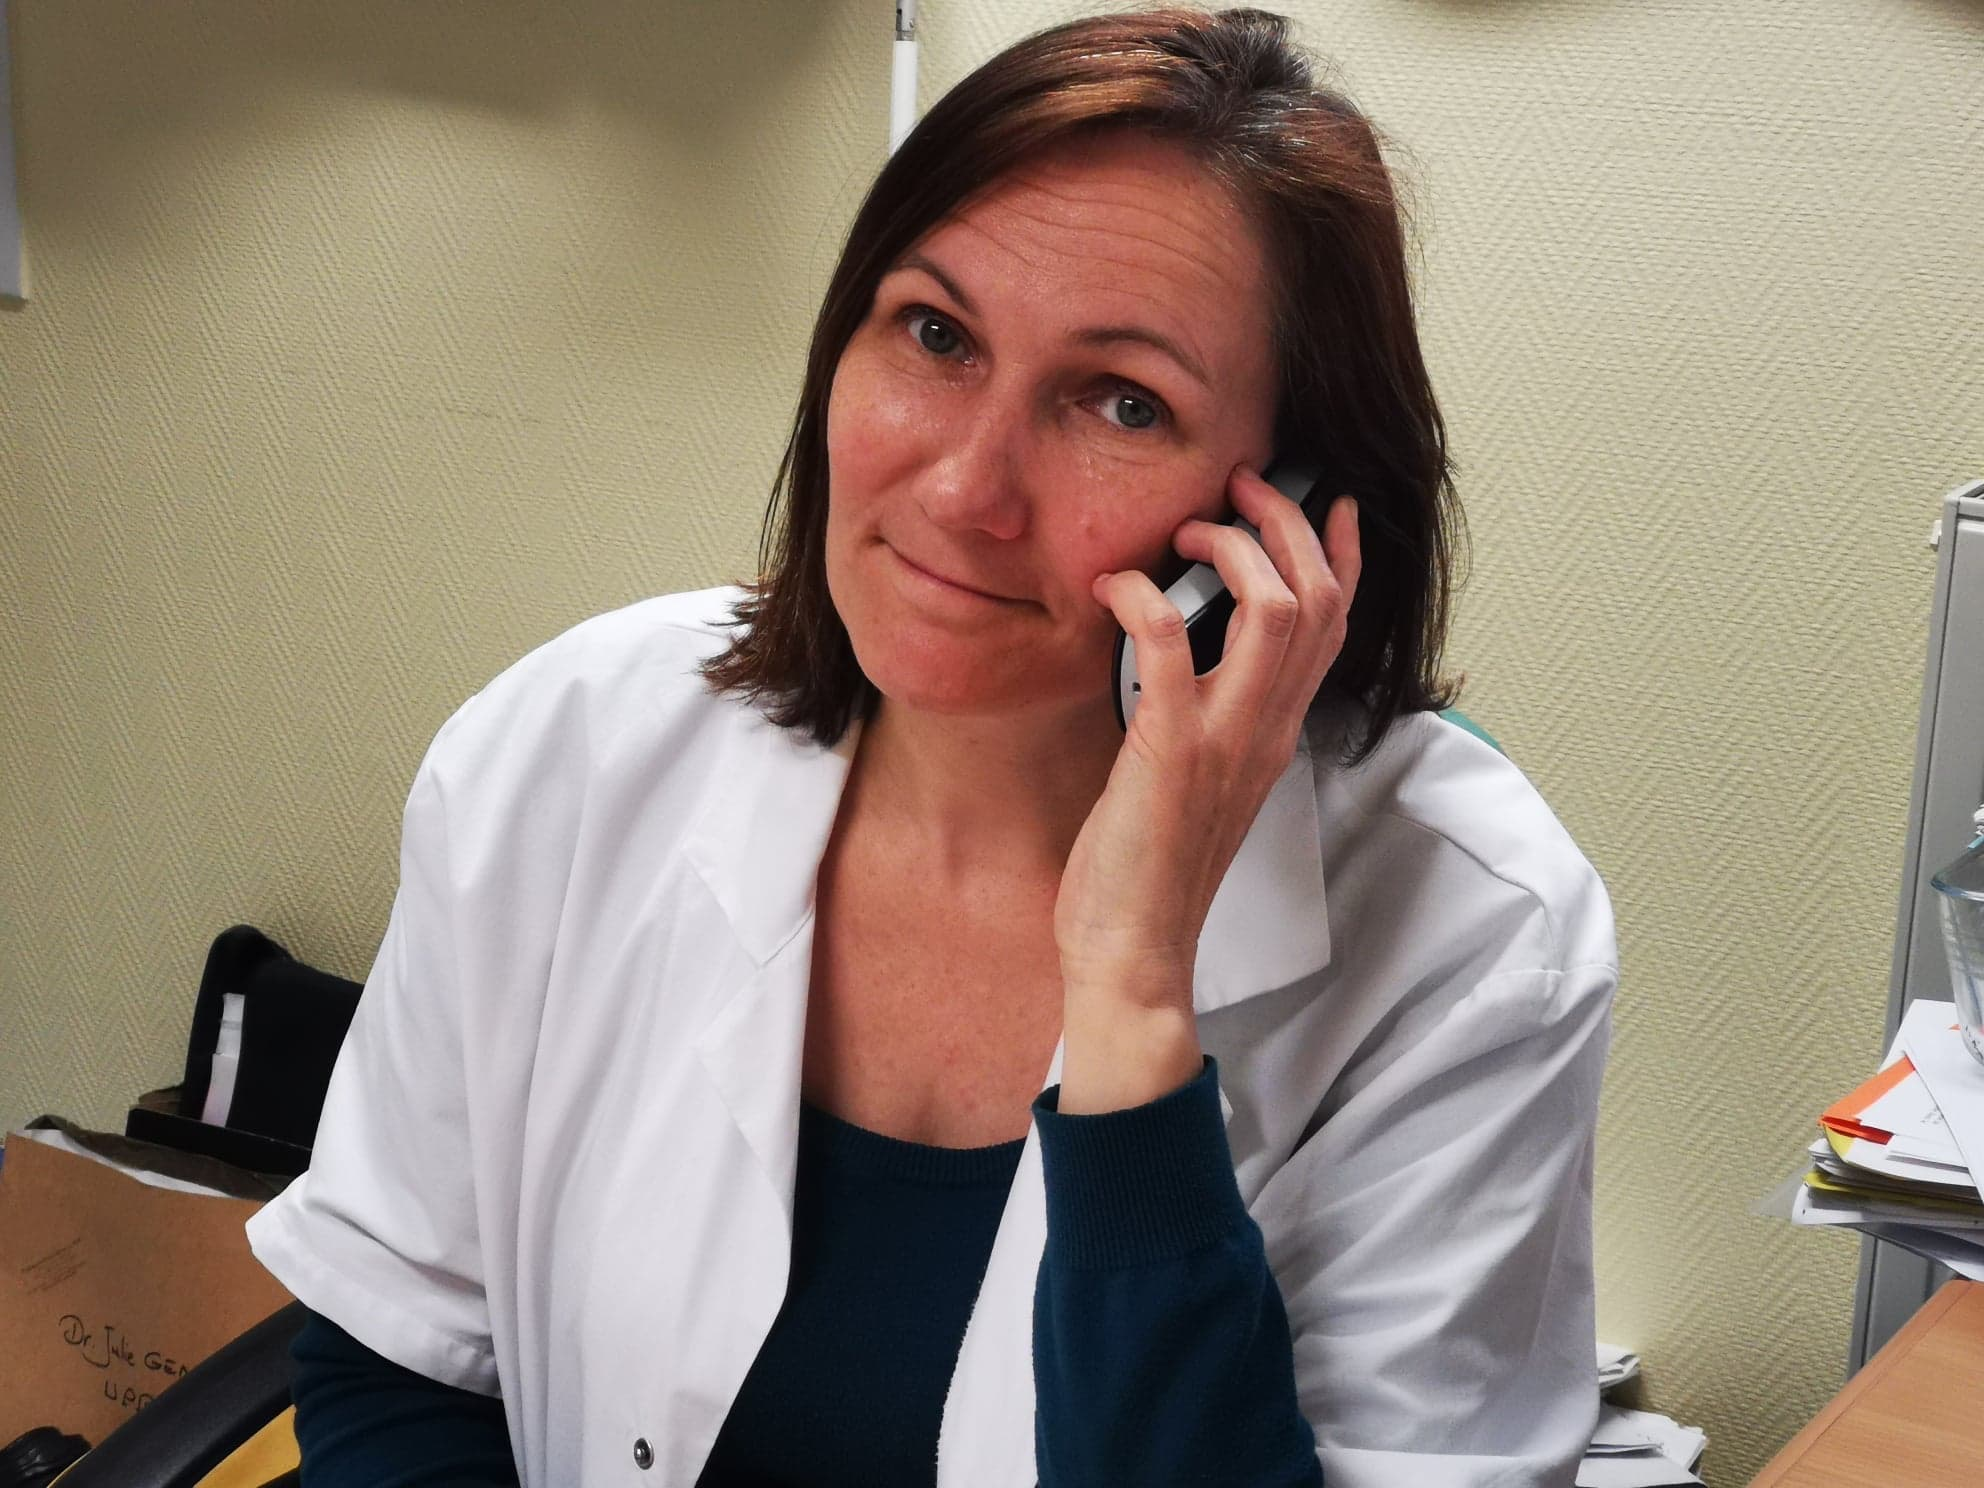 Docteur Julie Geneste